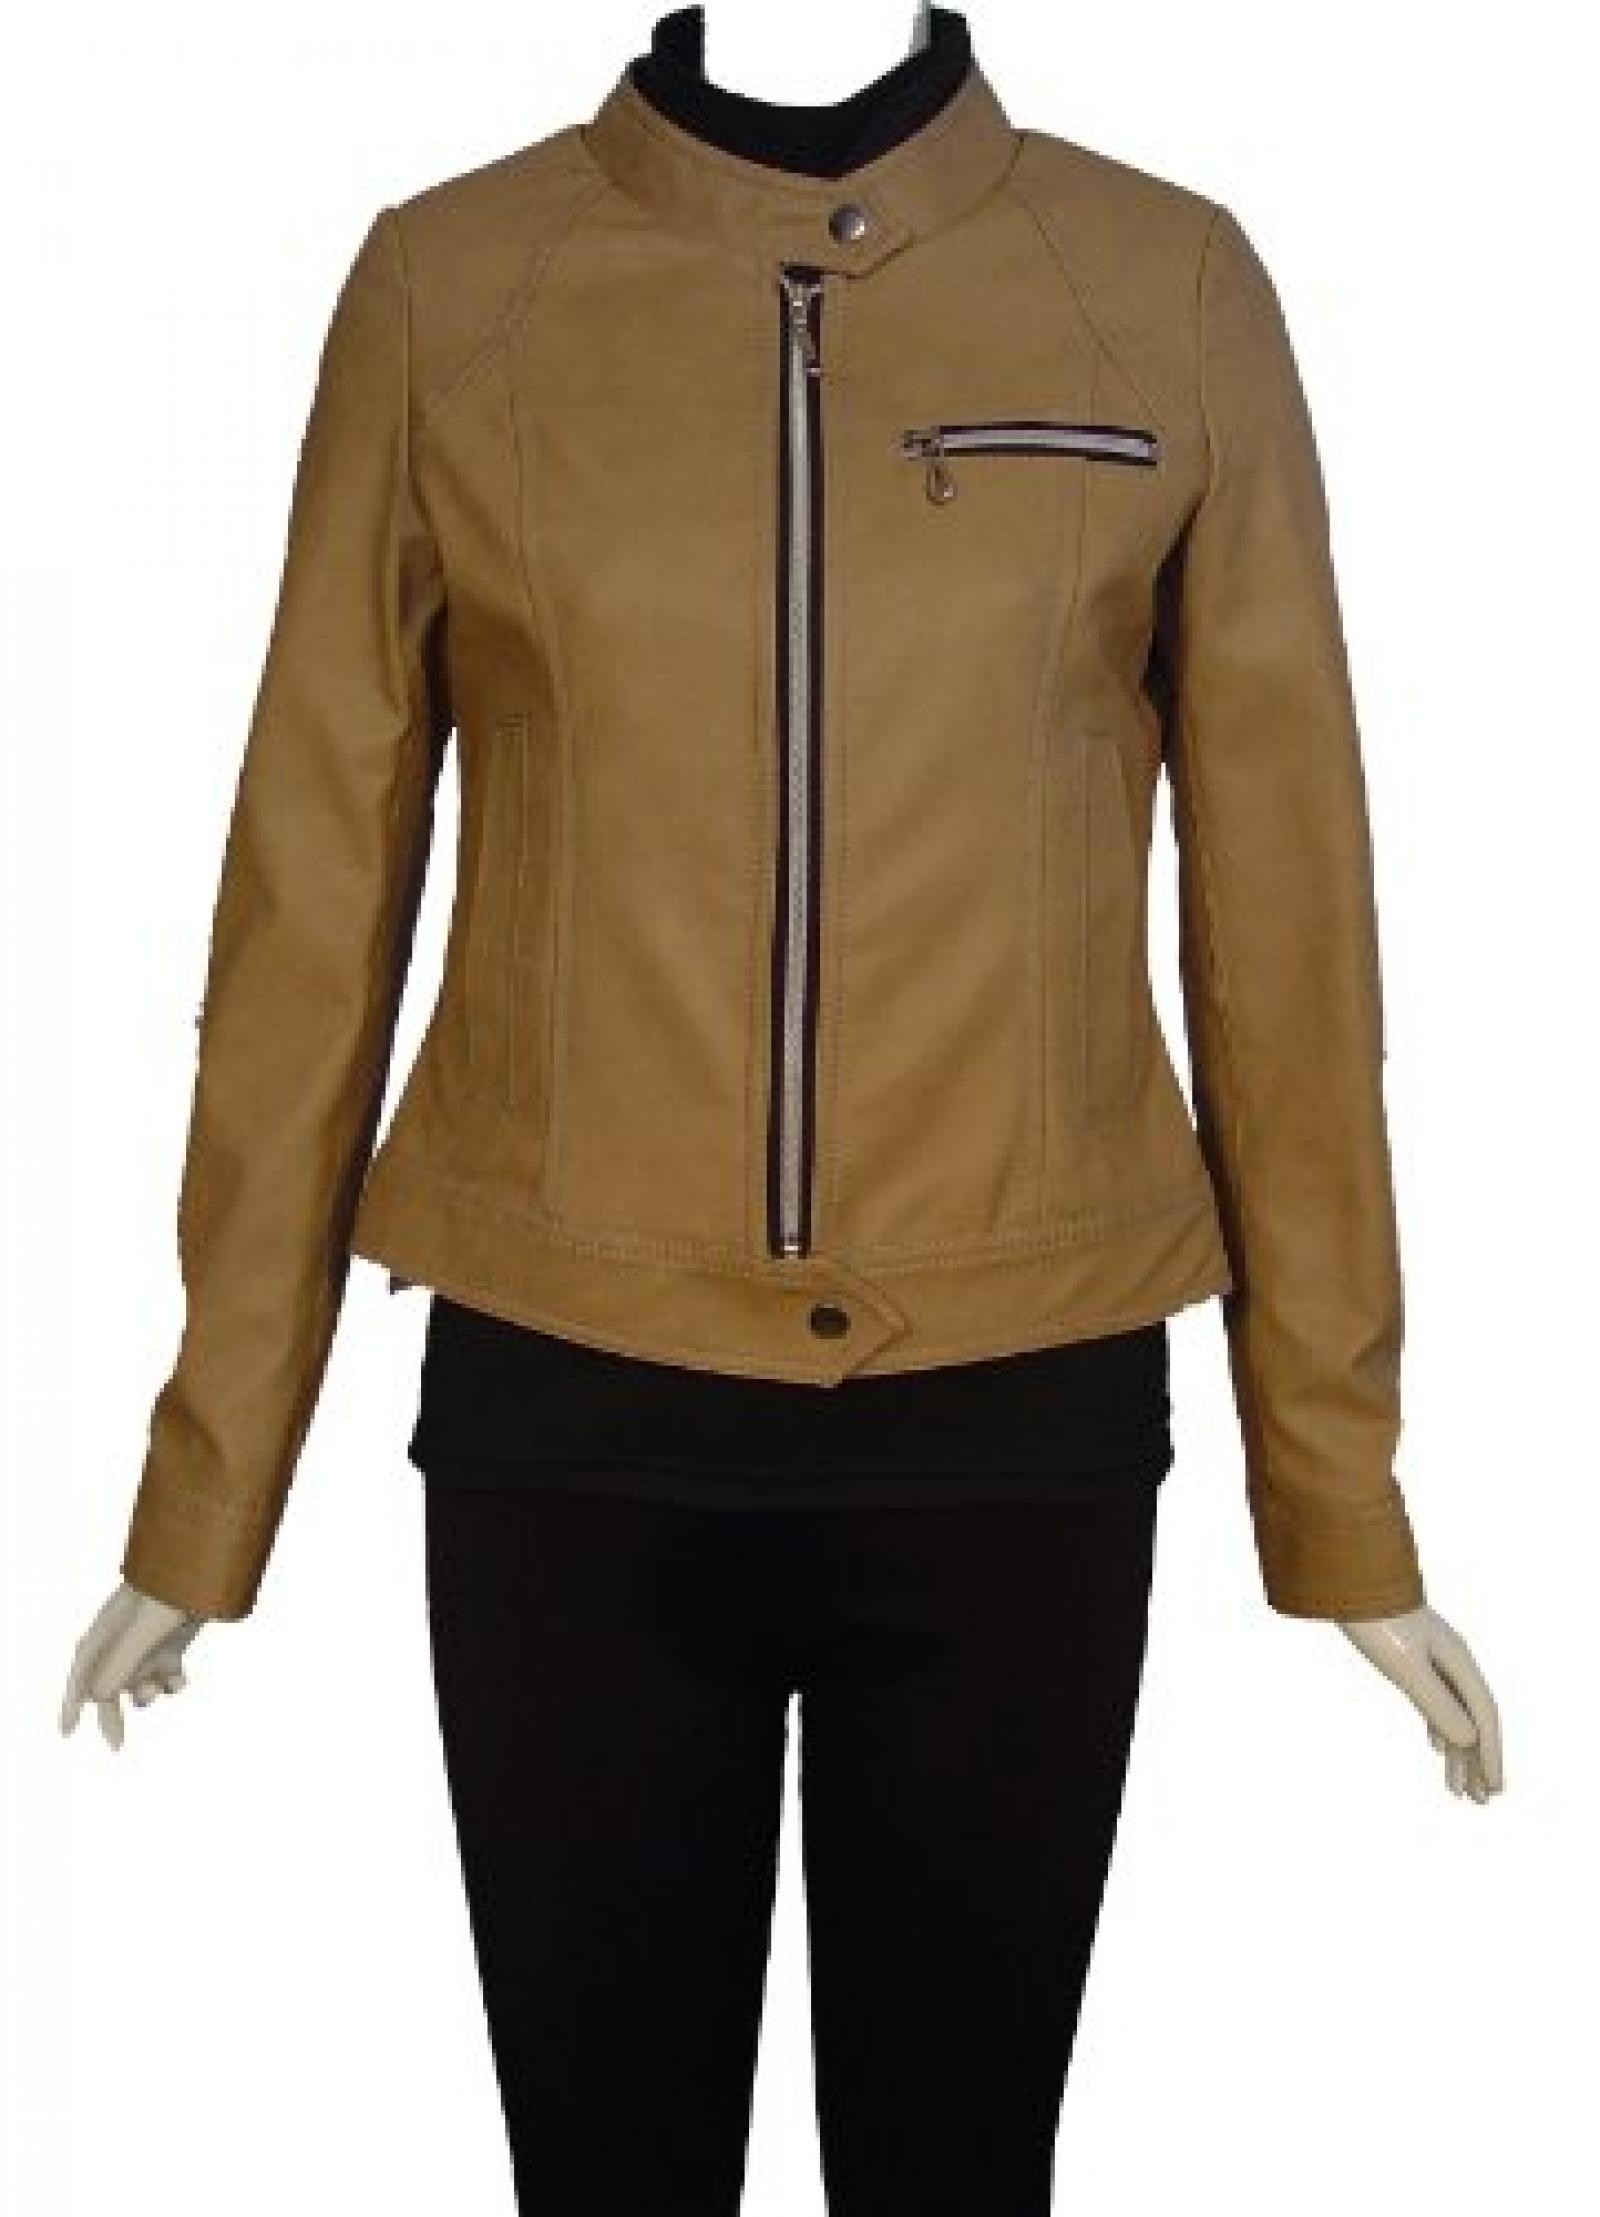 Nettailor Women PLUS SIZE 4063 Lamb Leather Motorcycle Jacket